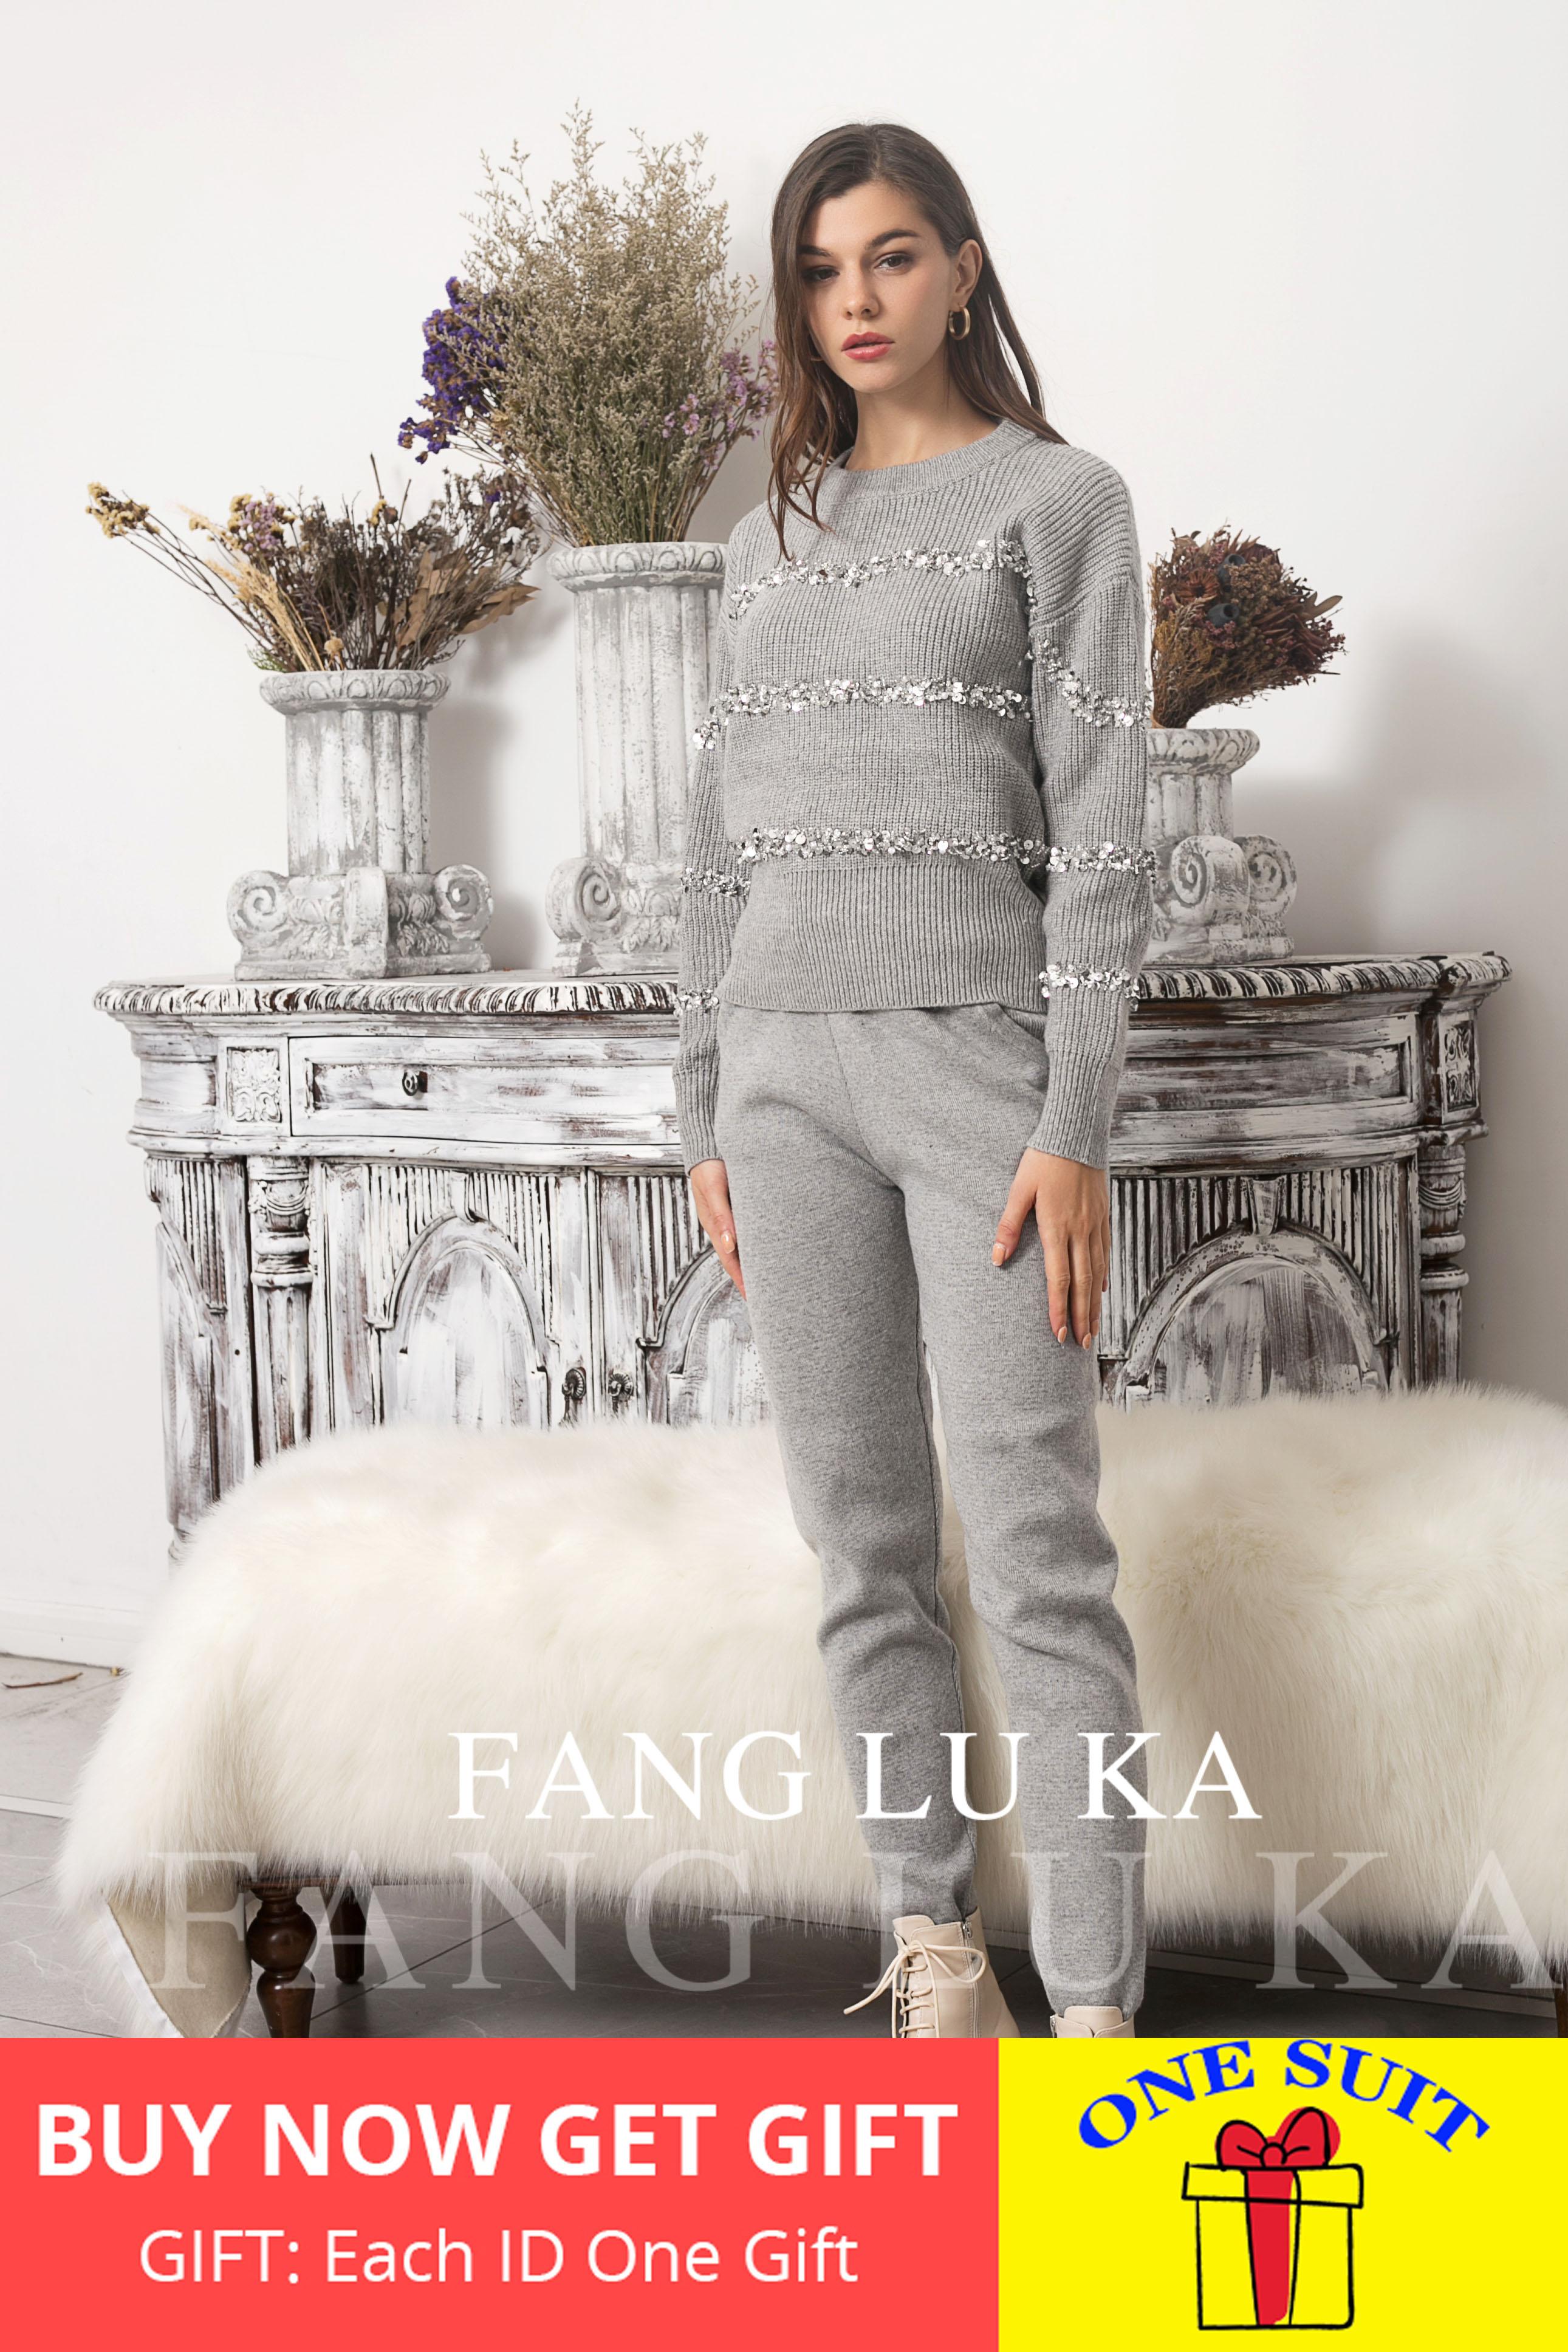 De Punto traje de mujer nueva moda exterior estilo lentejuelas jersey con abalorios polainas conjunto de dos piezas